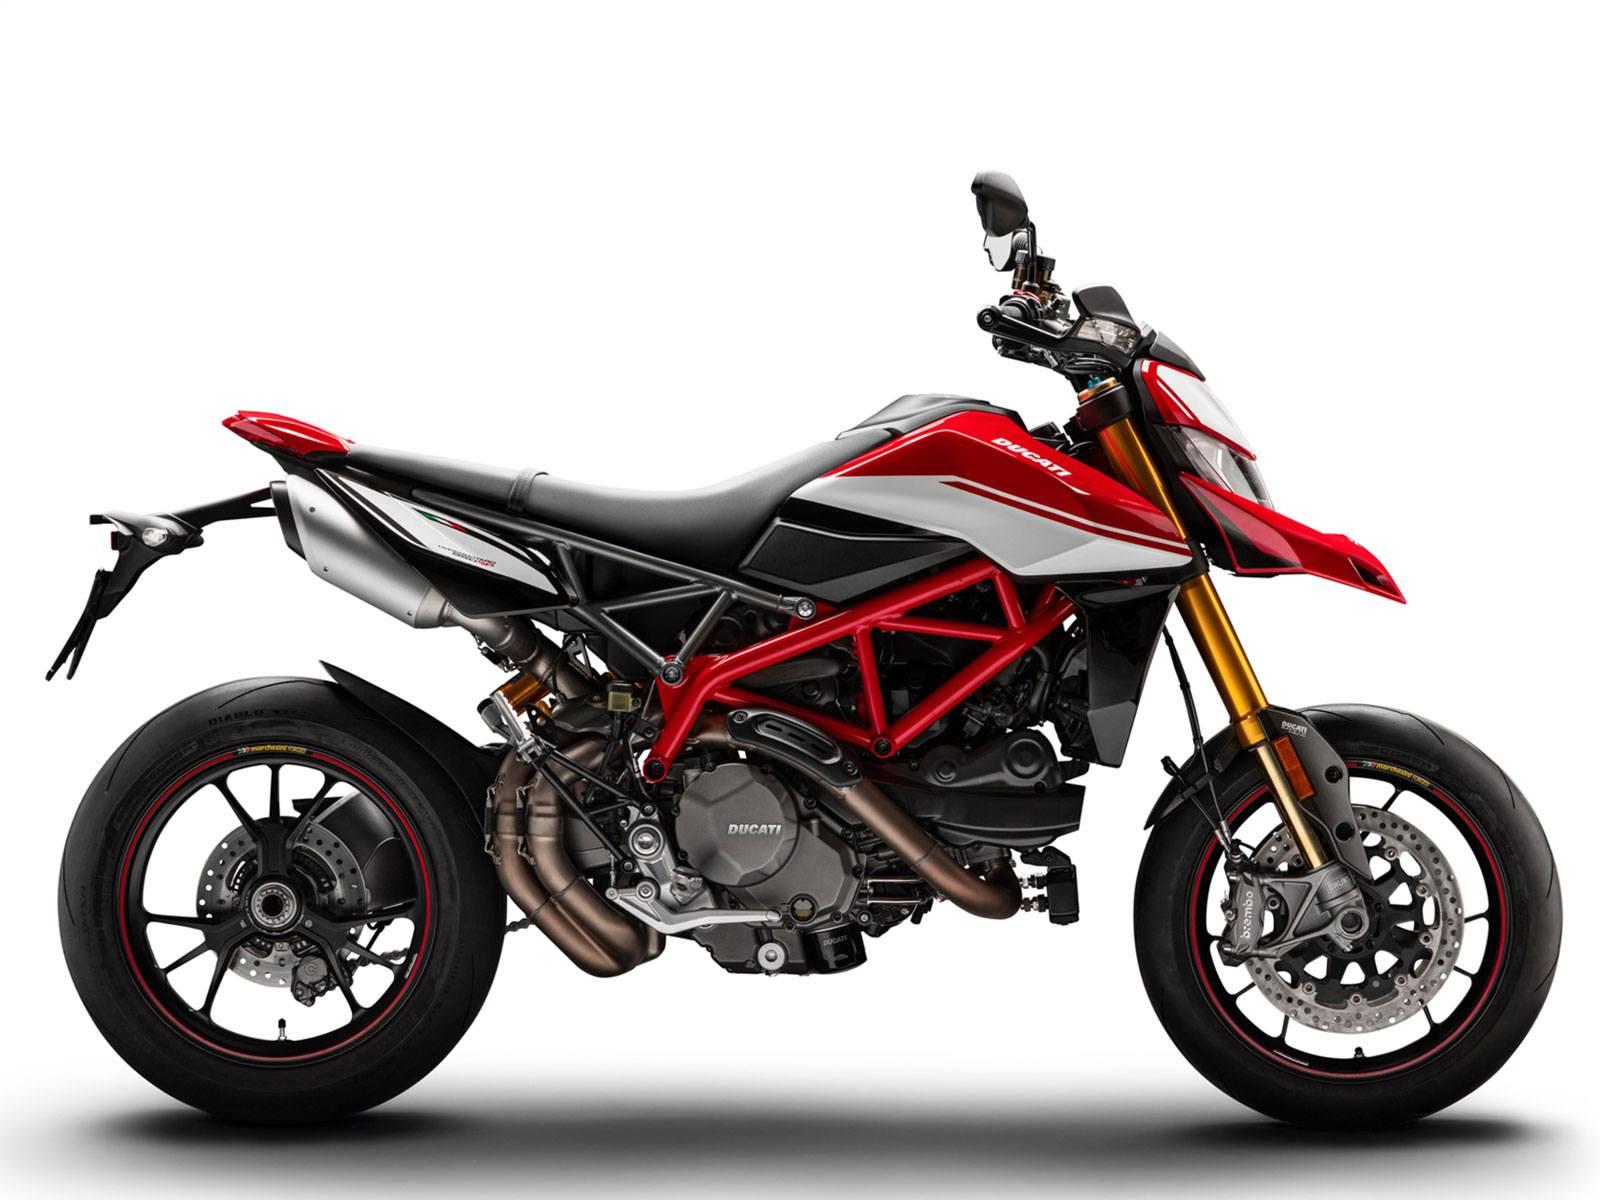 Мотоцикл DUCATI Hypermotard 950 SP - Livery (2019)